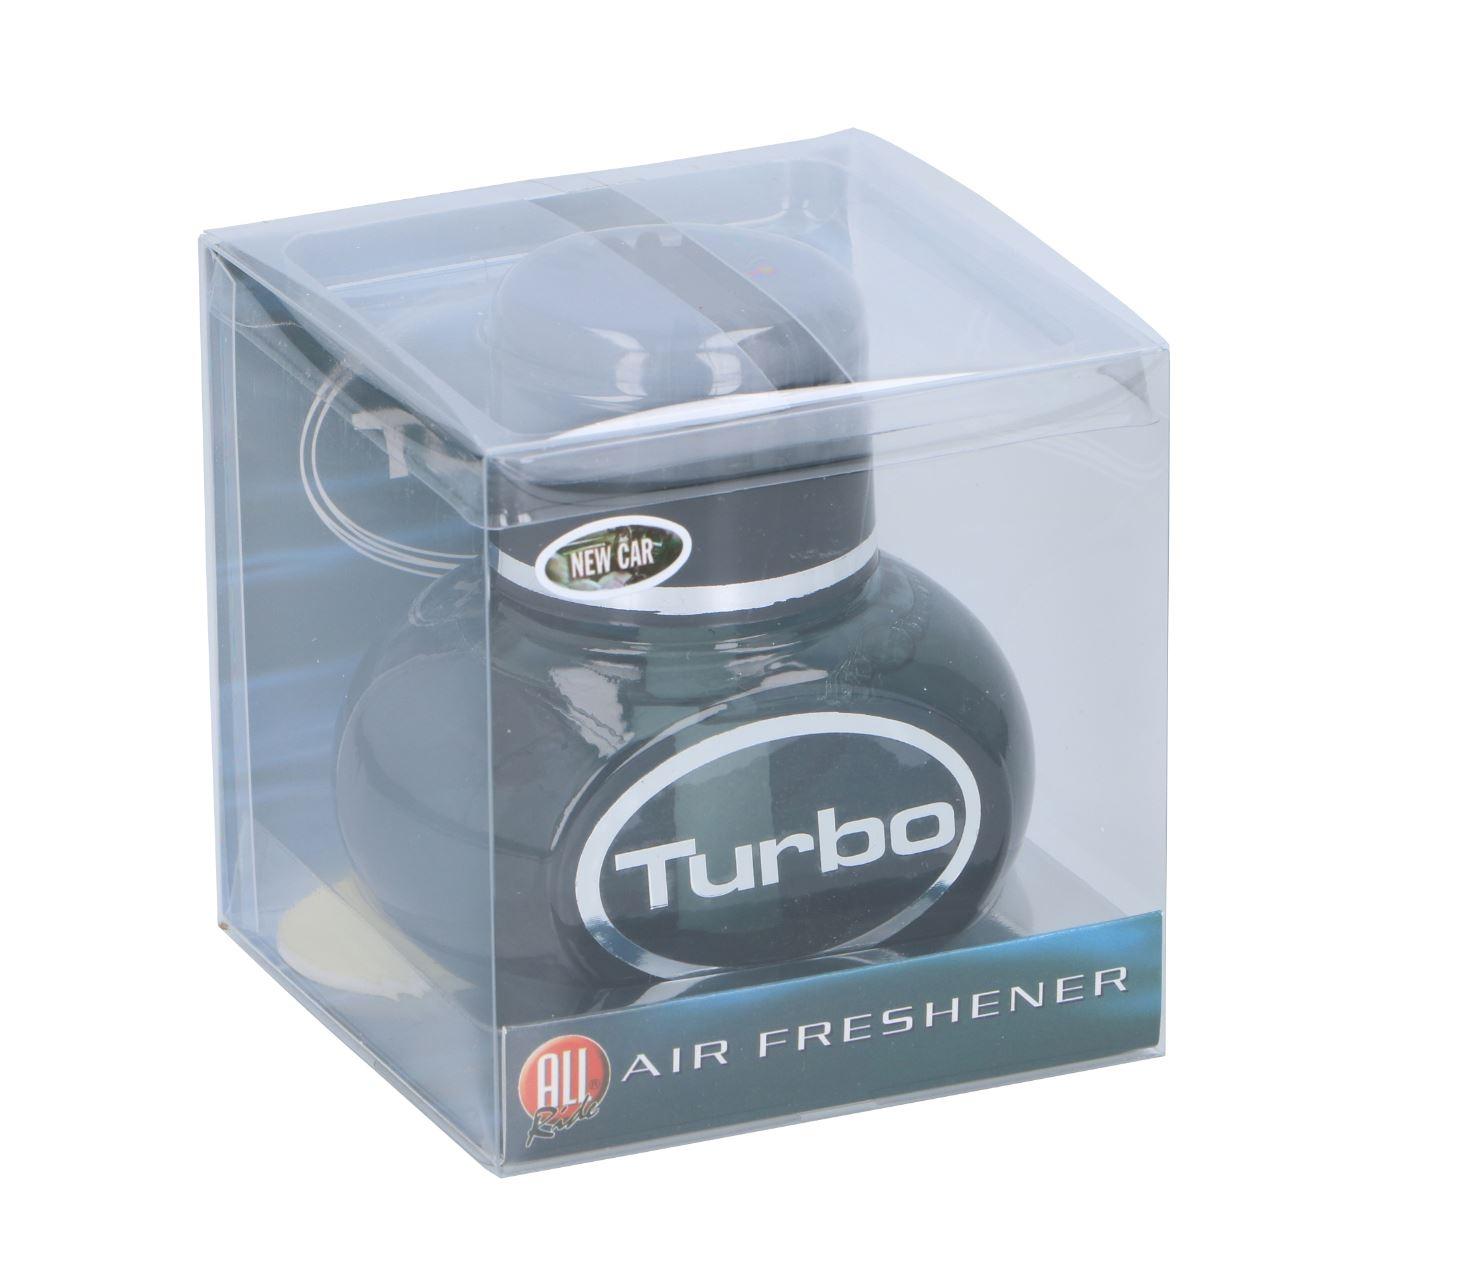 Turbo Doft - Nybil 150 Ml